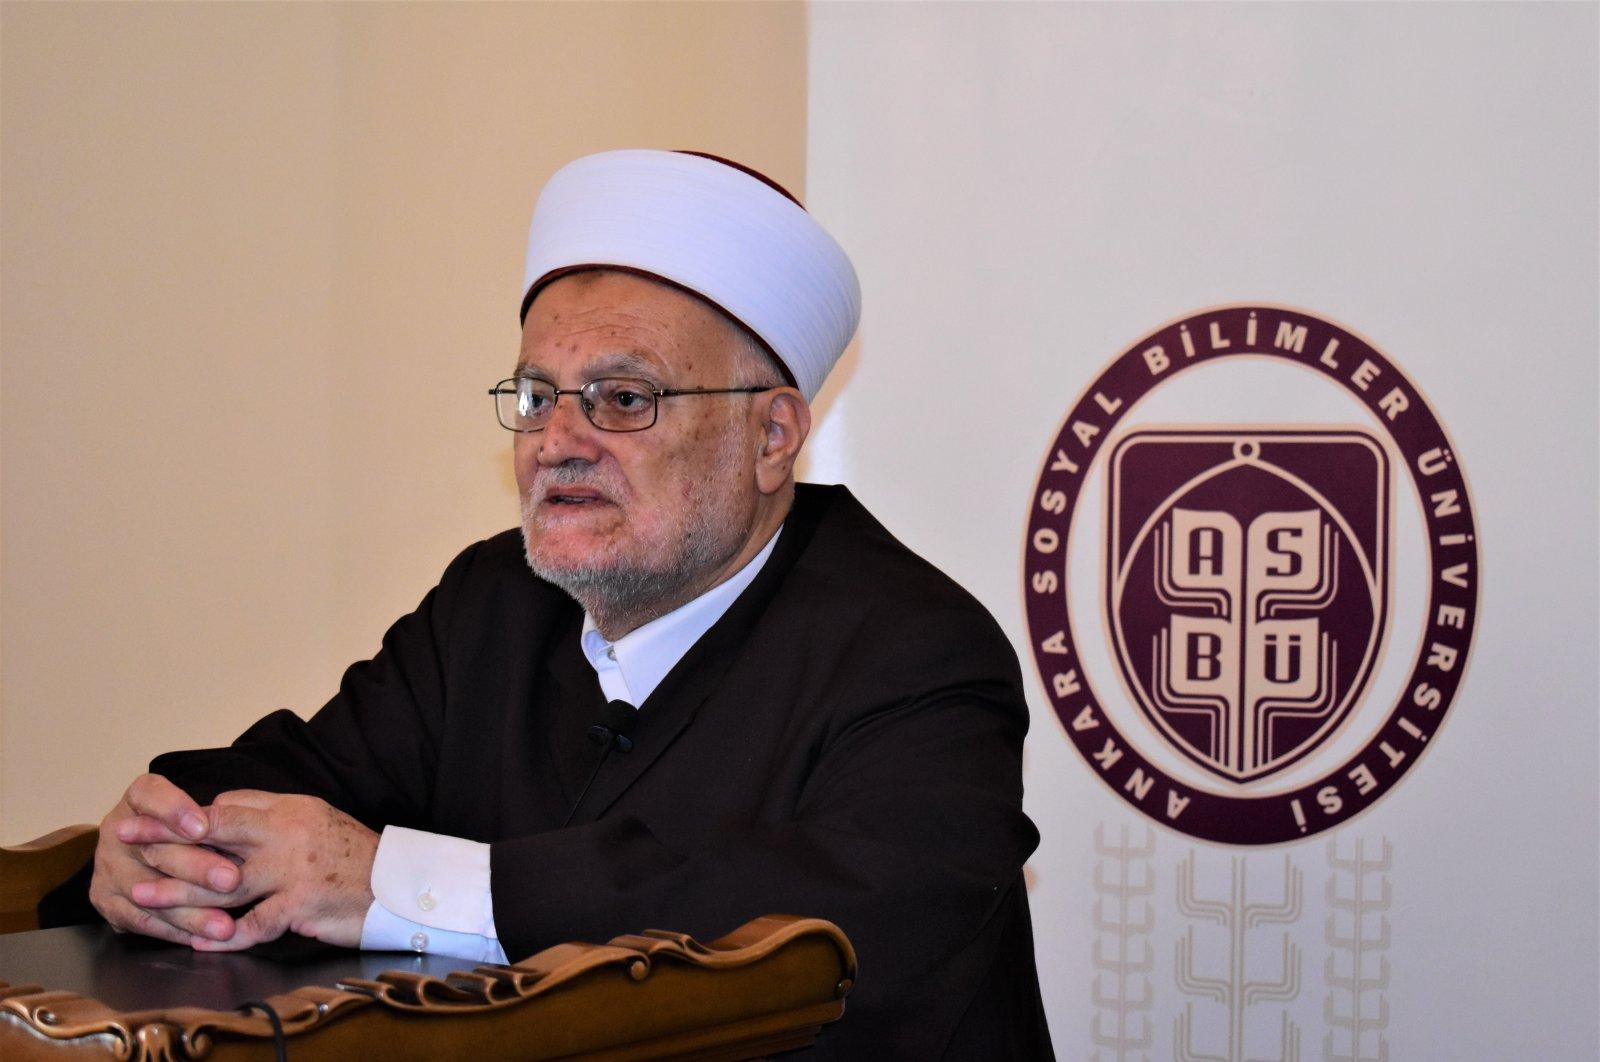 Al-Aqsa Mosque imam Sheikh Ekrema Sabri speaks at a conference at the Social Sciences University of Ankara, Nov. 26, 2020. (AA Photo)